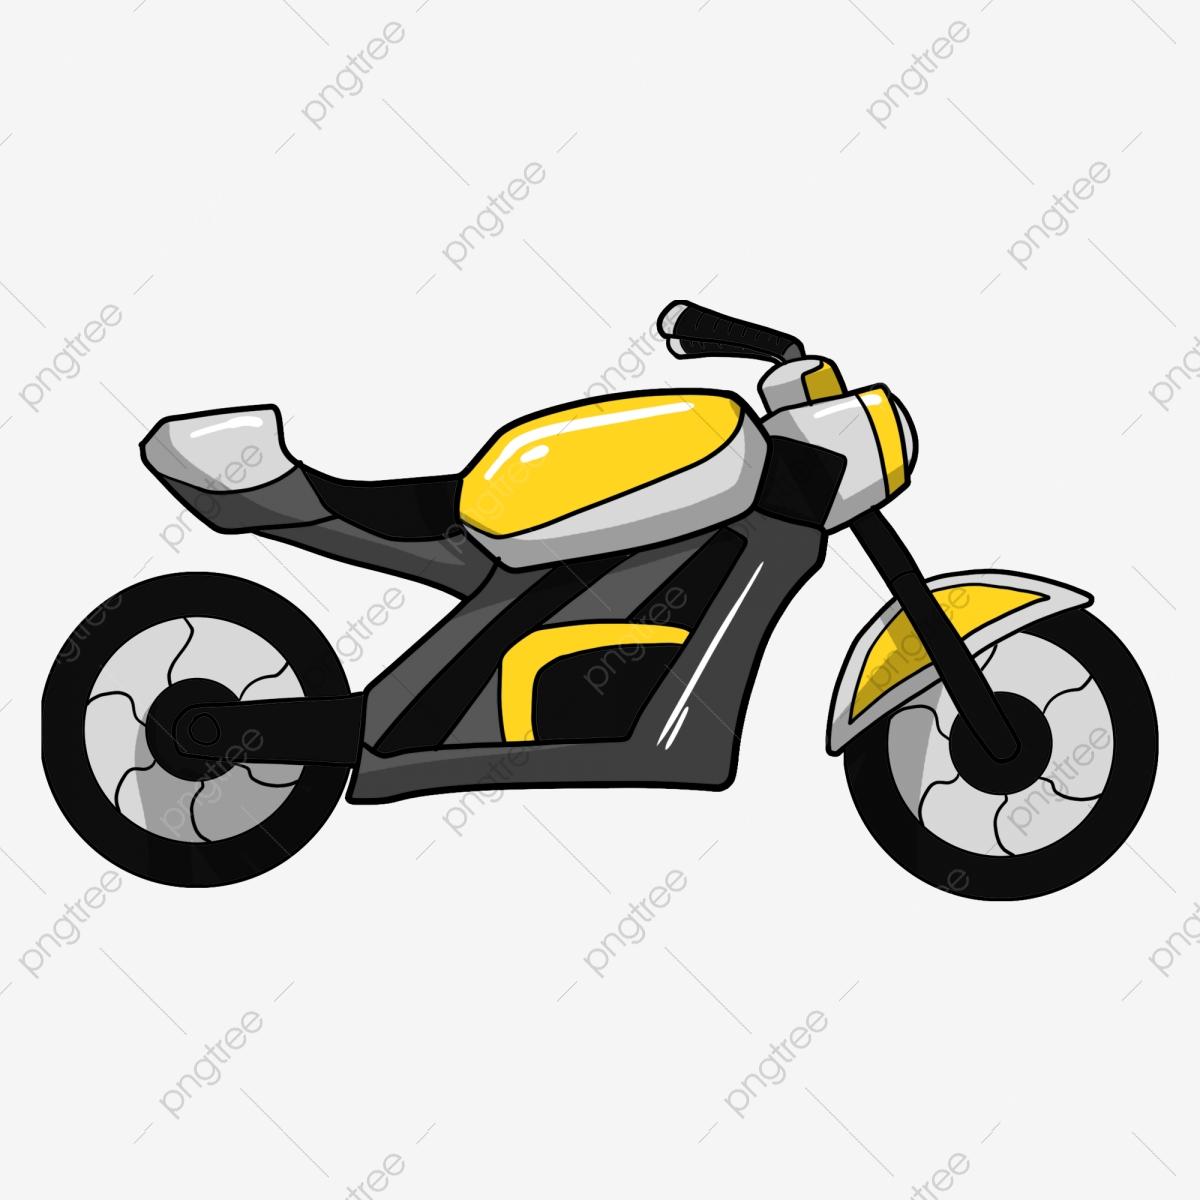 Motorcycle clipart road transport. Transportation off sports traffic